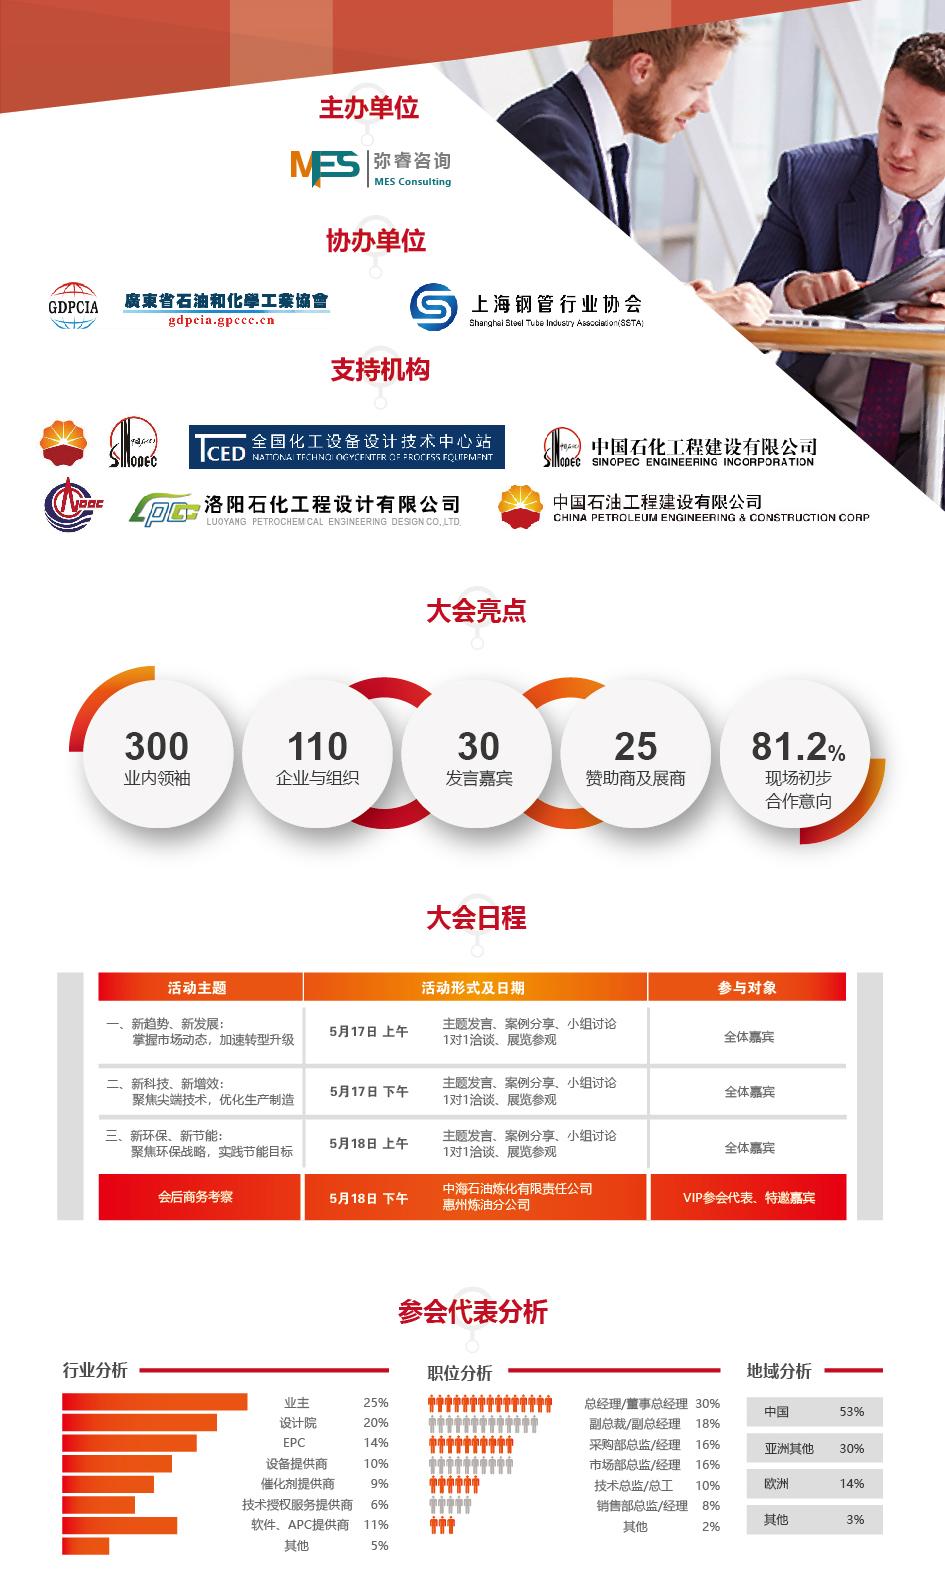 IRCC 2018国际炼化产业大会